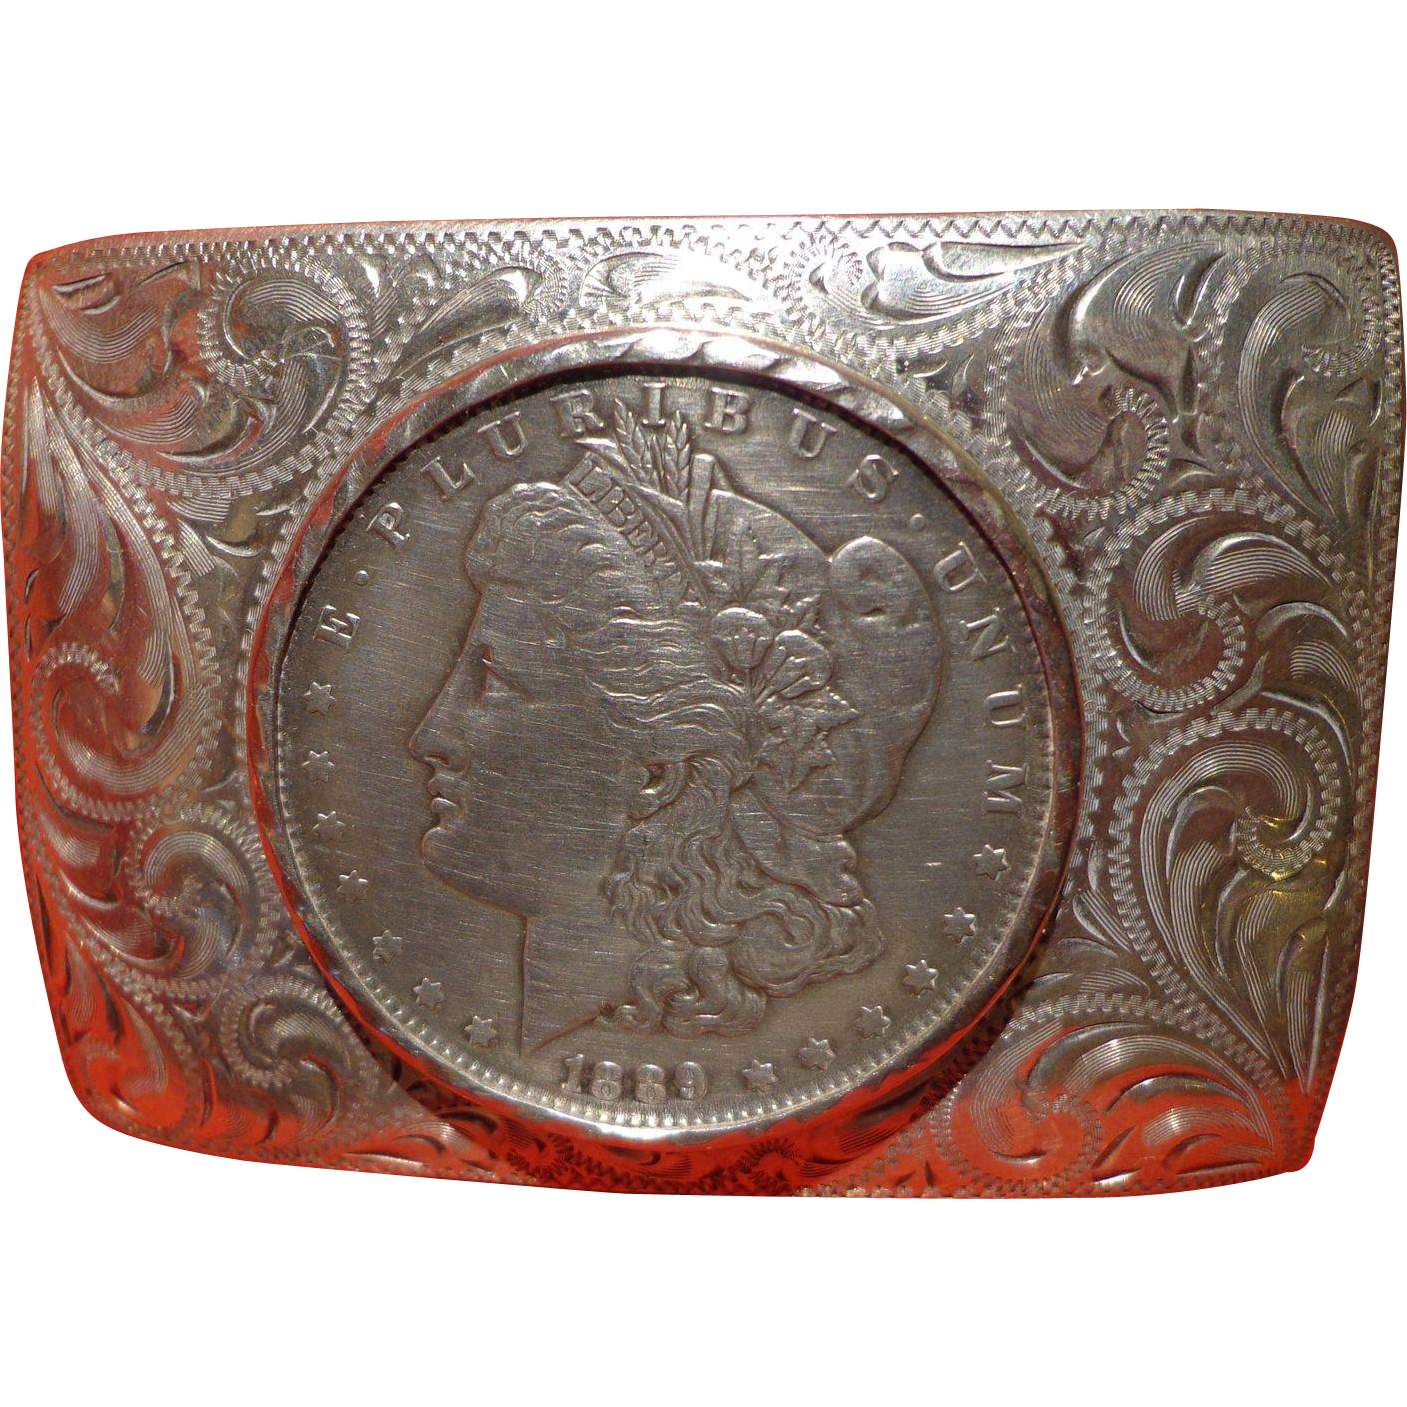 Vintage Sterling Silver Cowboy Belt Buckle 925 Morgan